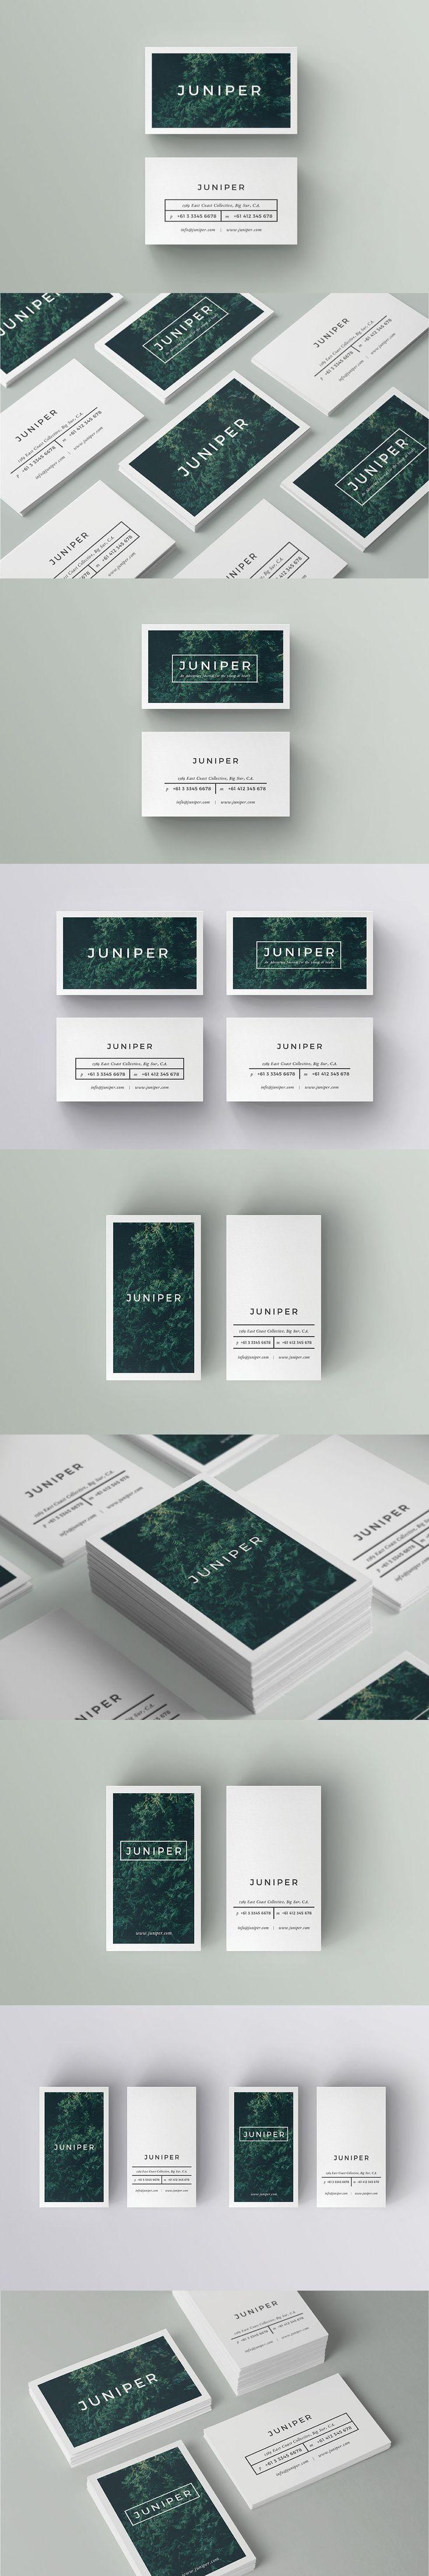 A Beautiful Multipurpose Business Card Template INDD, PSD